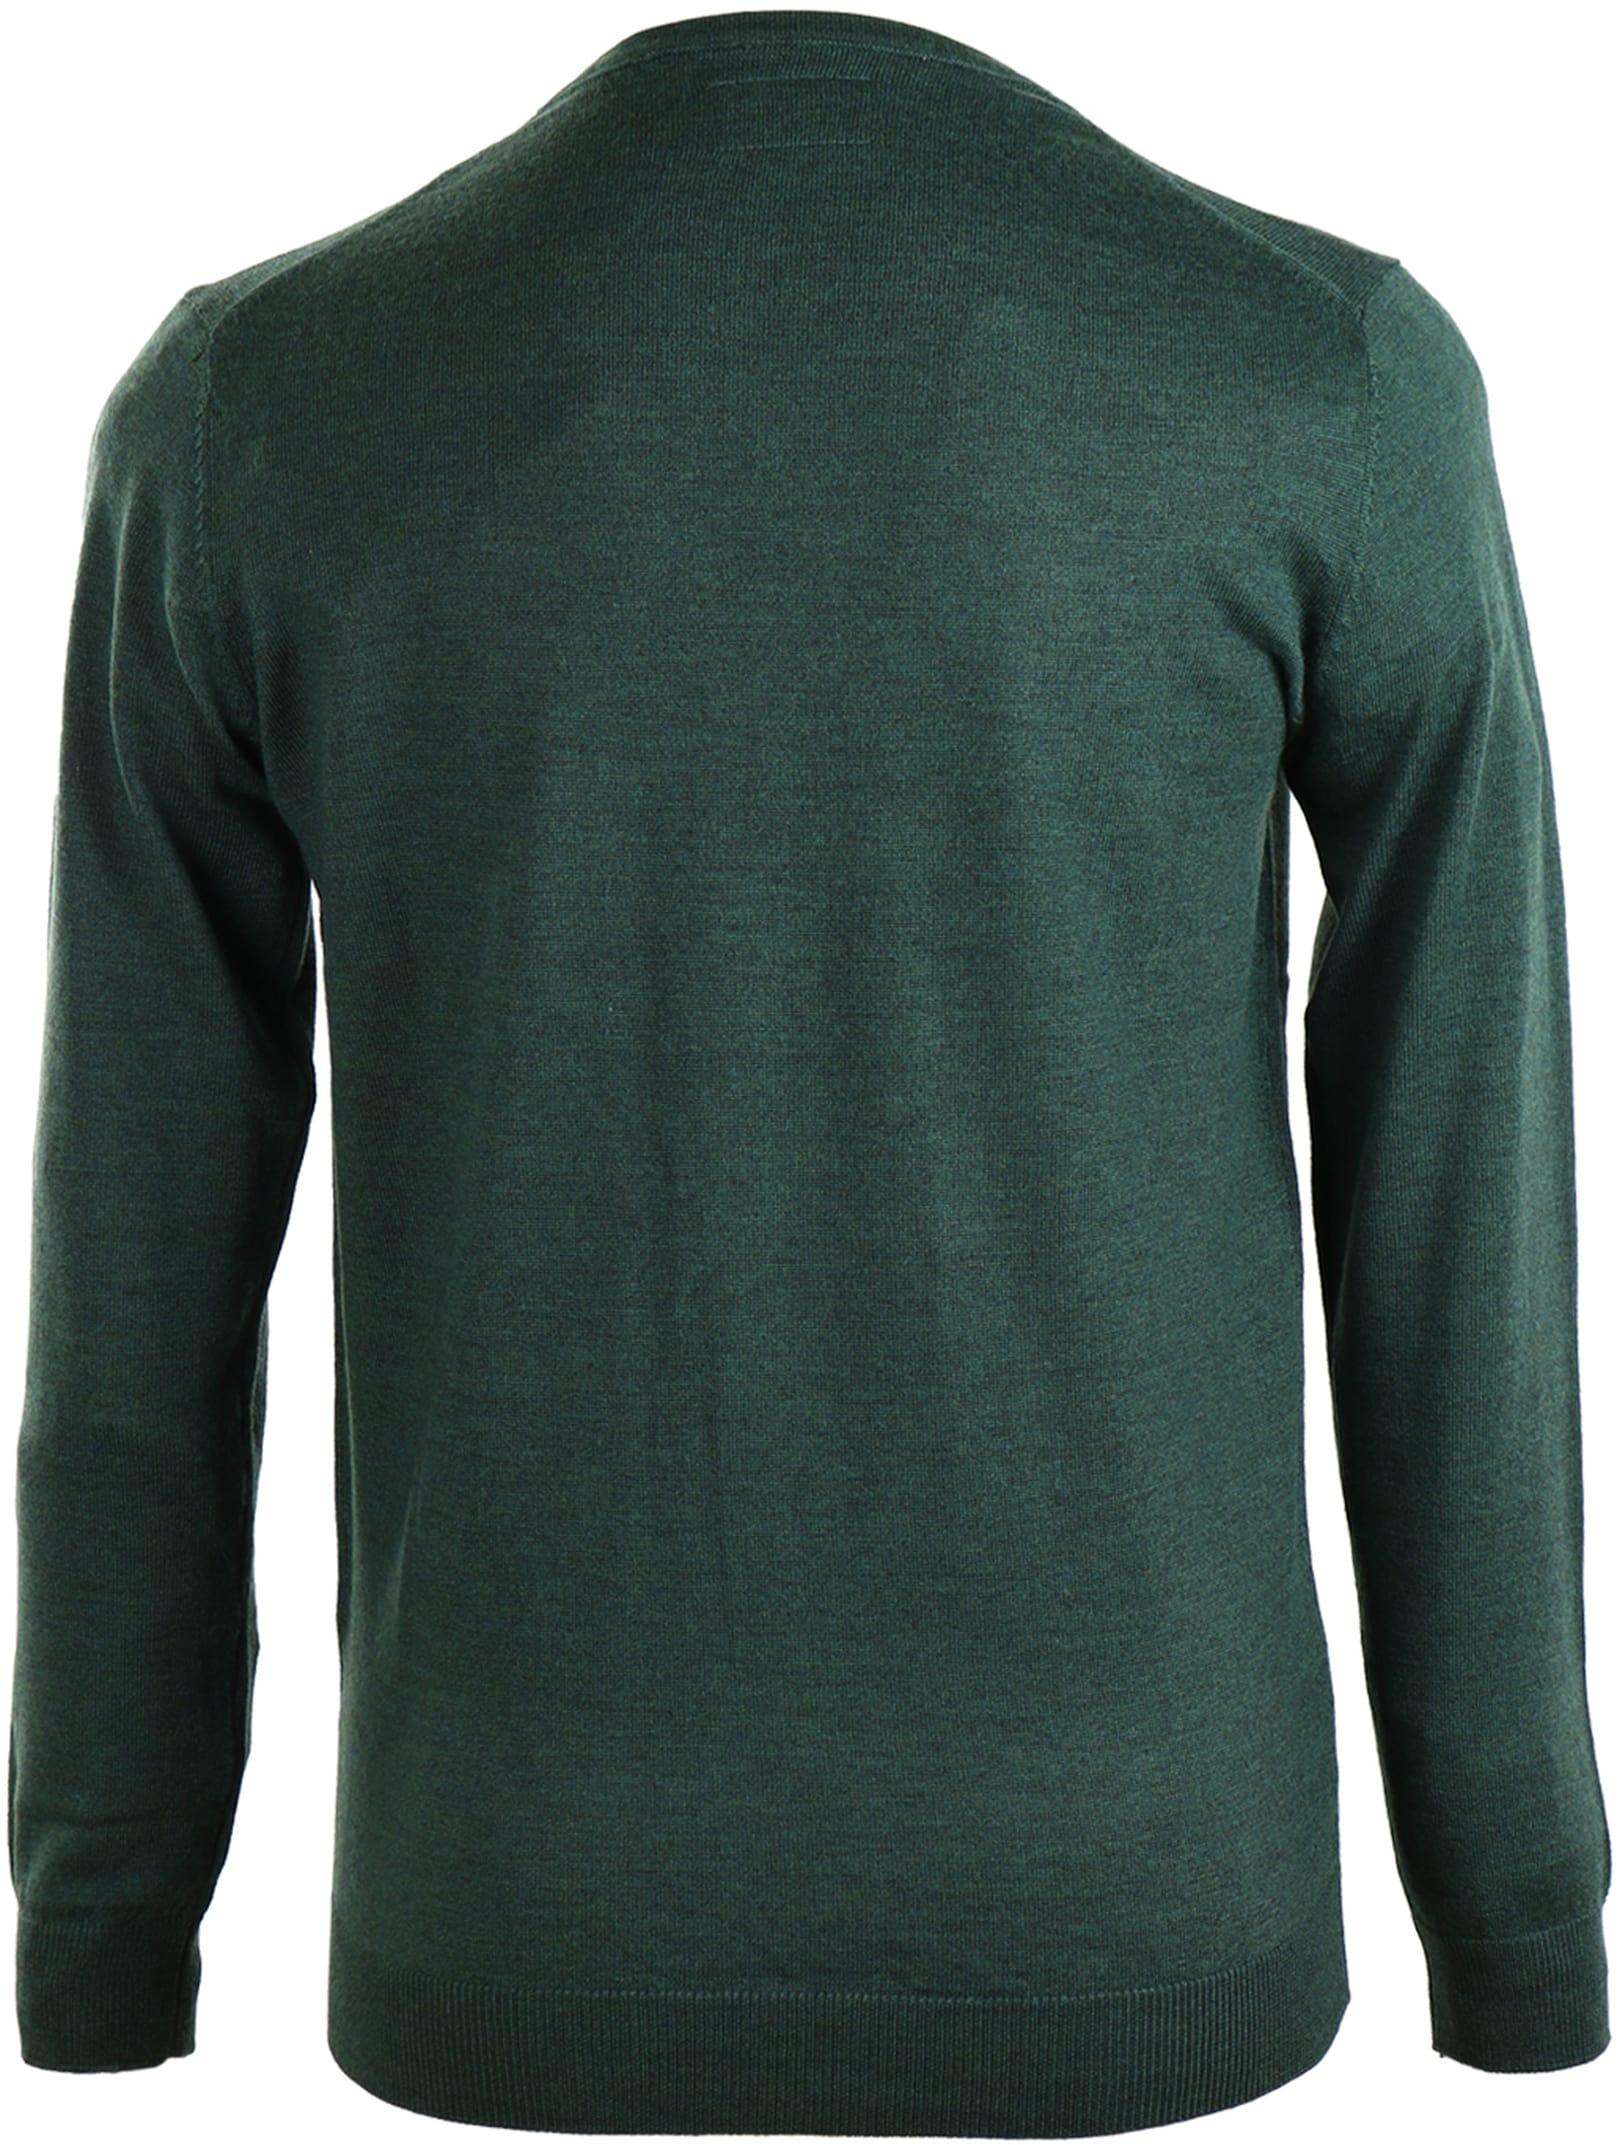 Suitable Pullover Merino Wol Groen foto 1